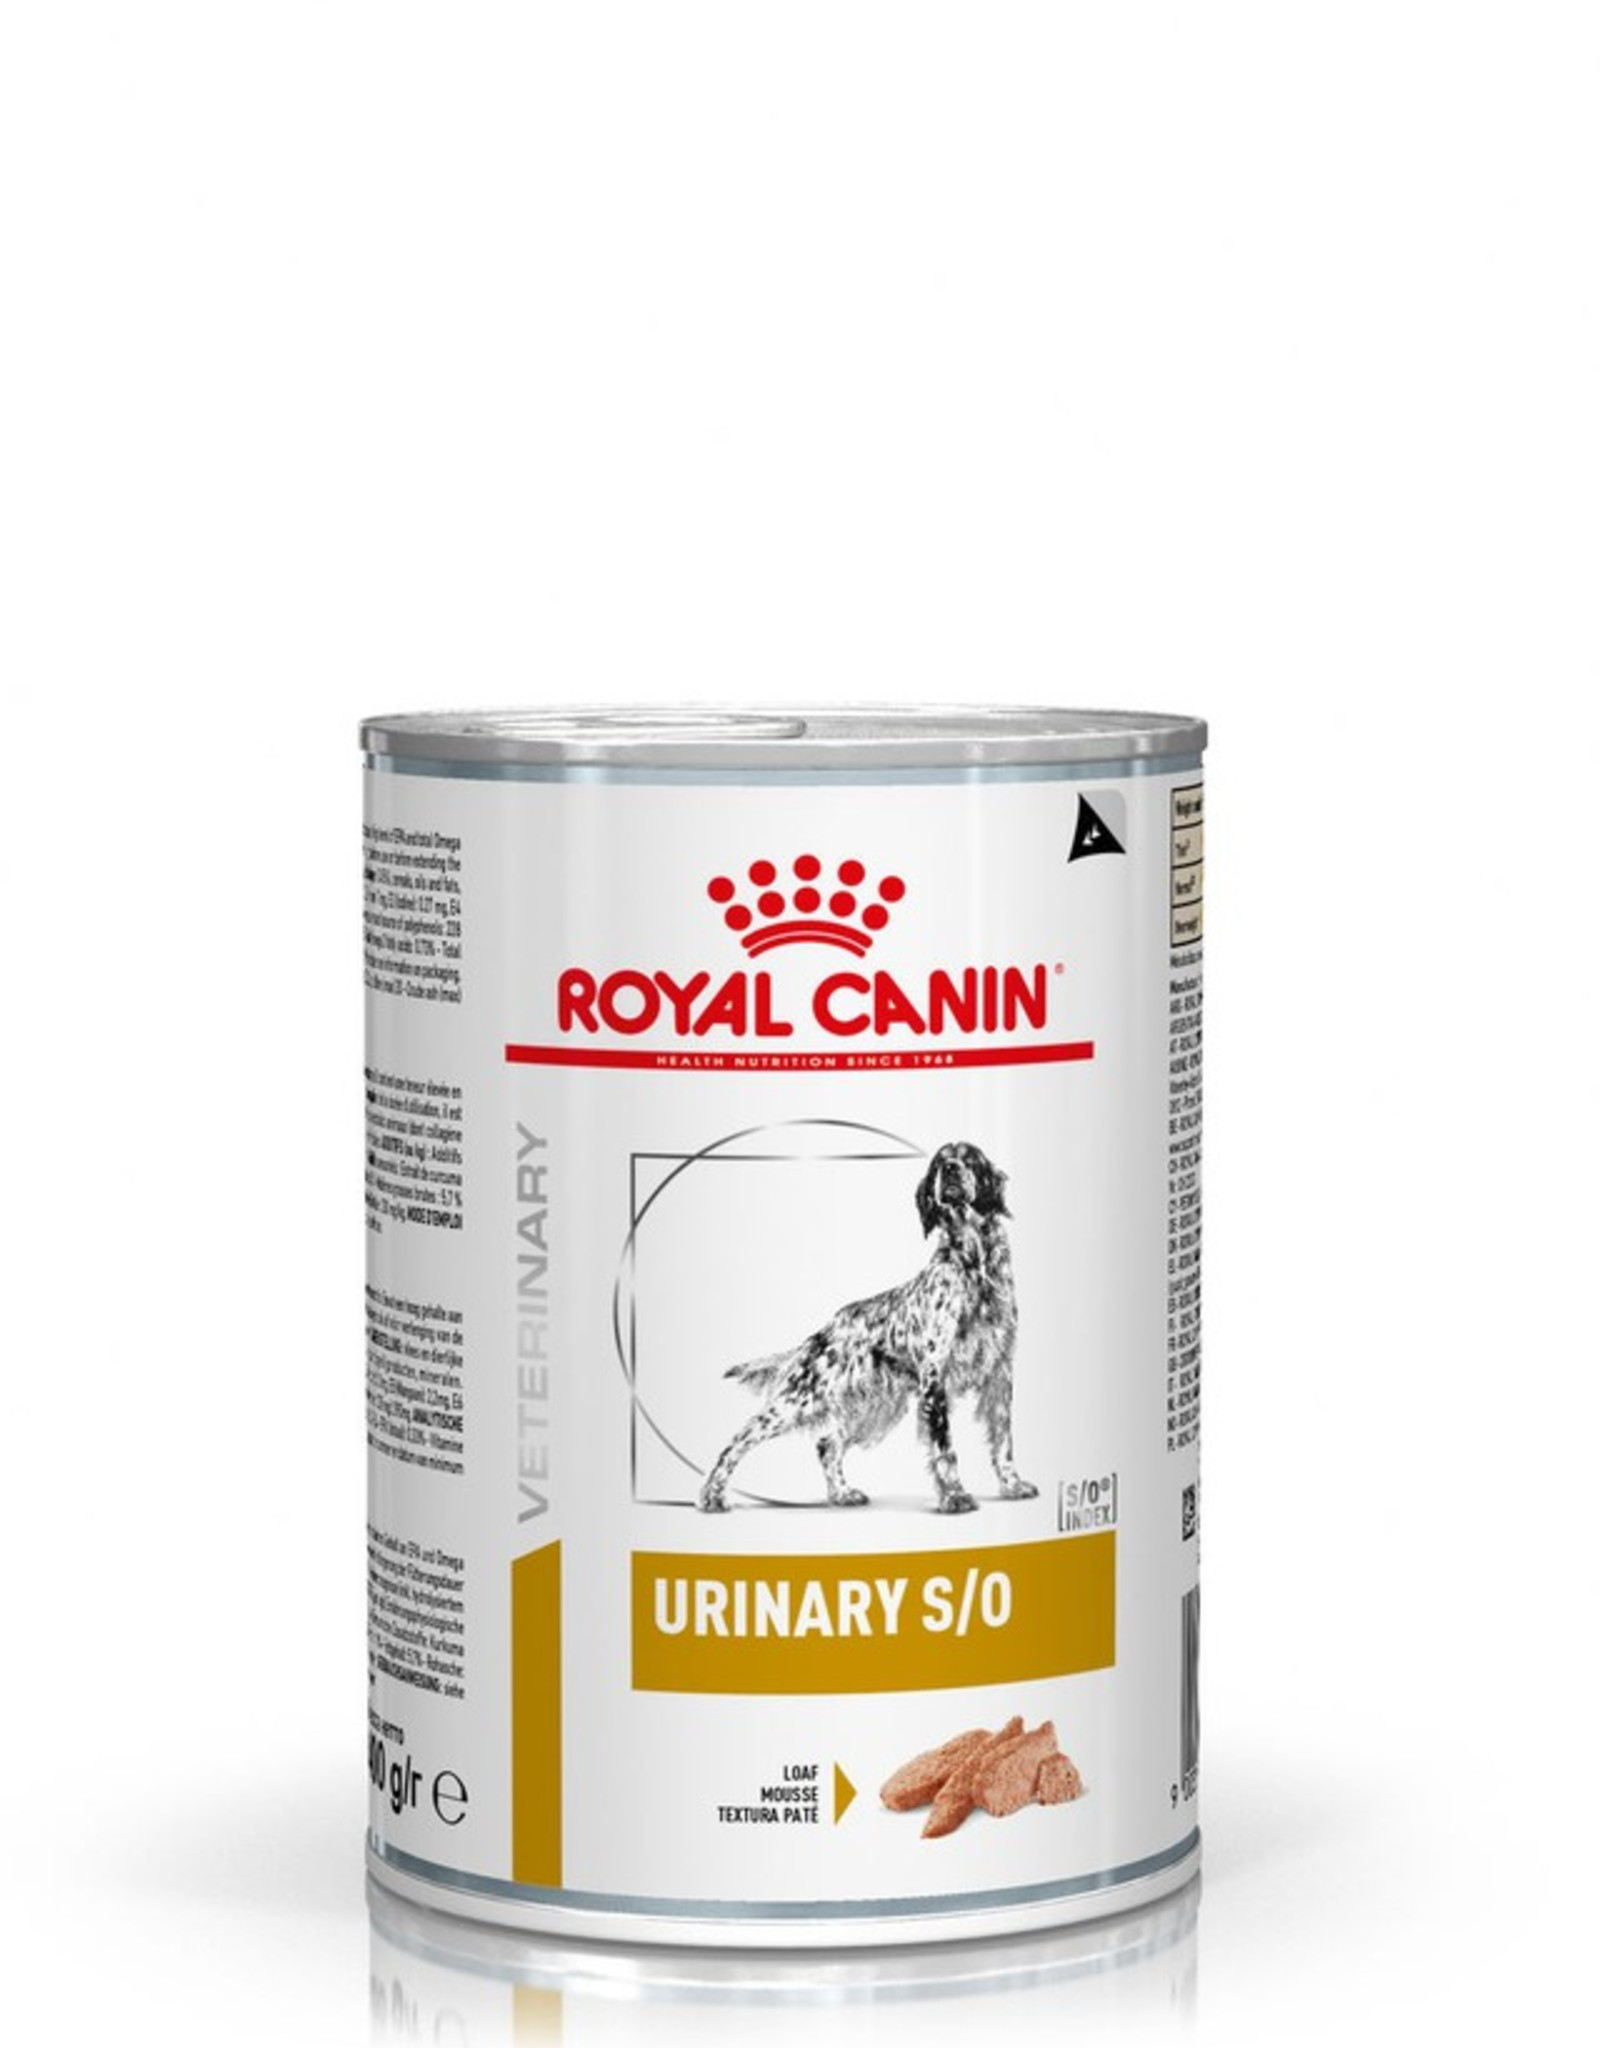 Royal Canin Royal Canin Urinary S/o Chien 12x410gr